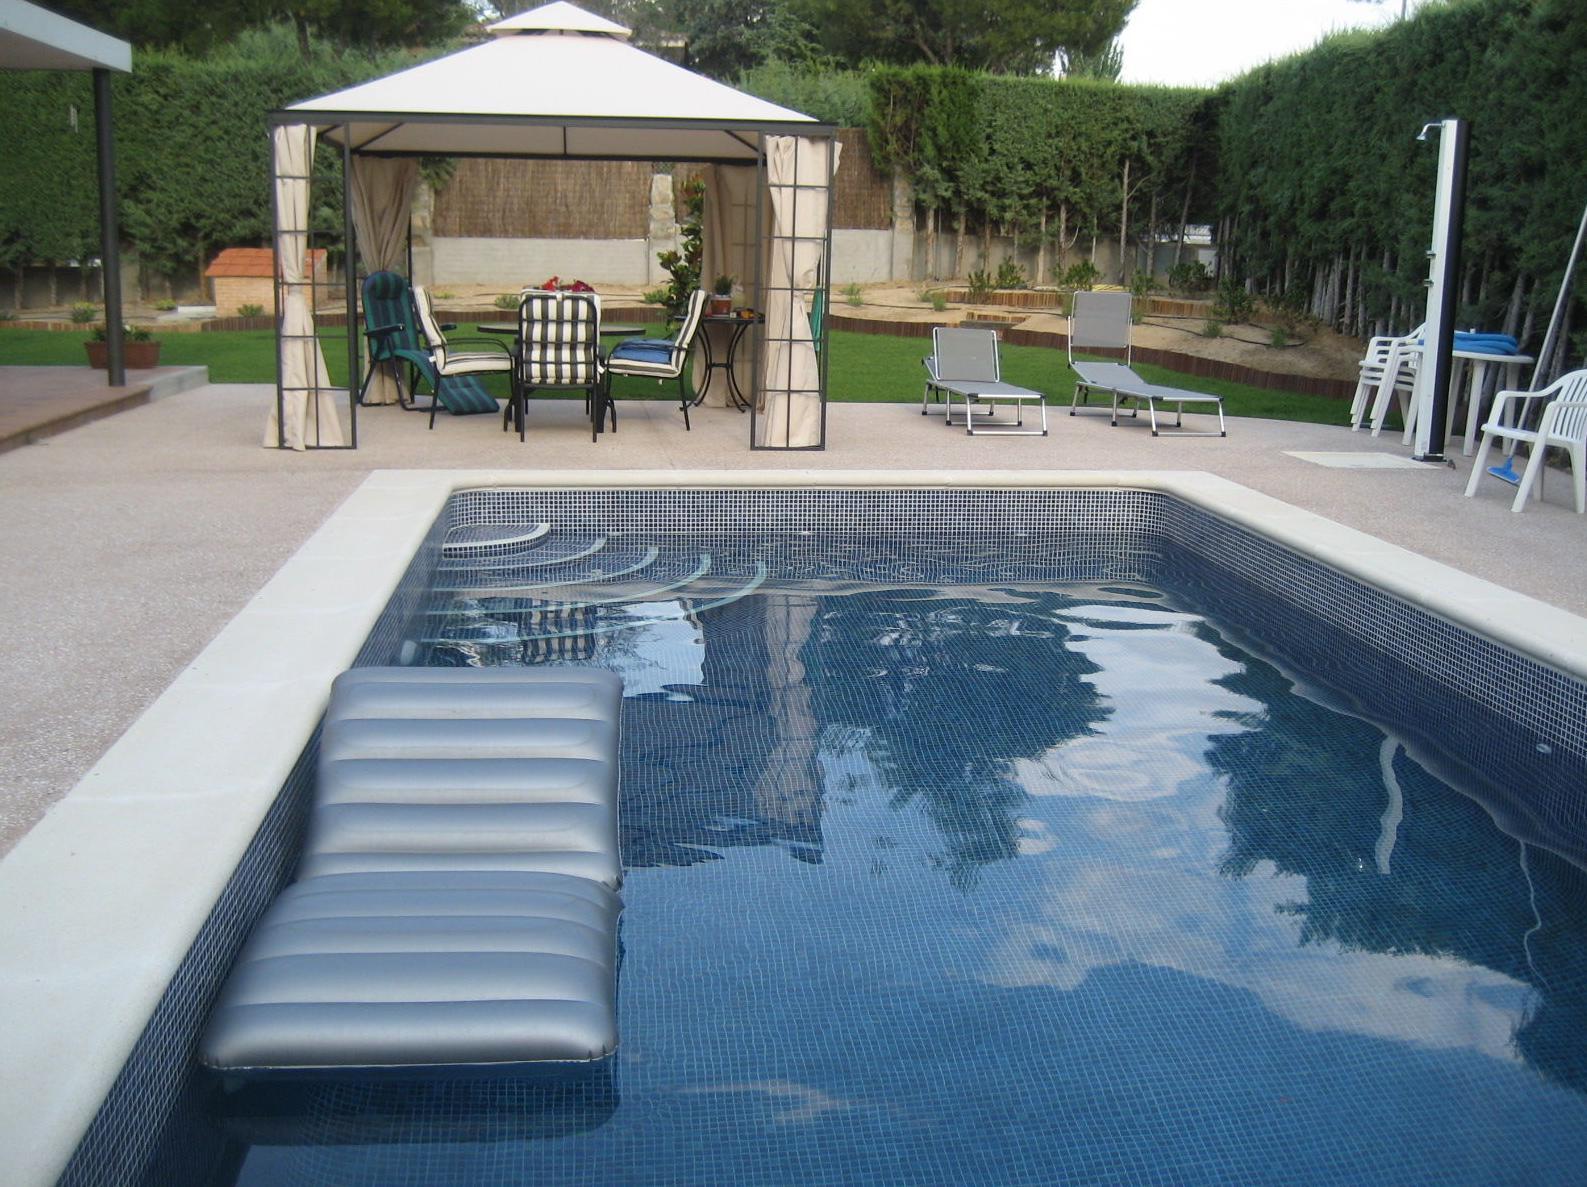 Precio piscina obra 8x4 great piscina obra con artificial for Precio piscina de obra